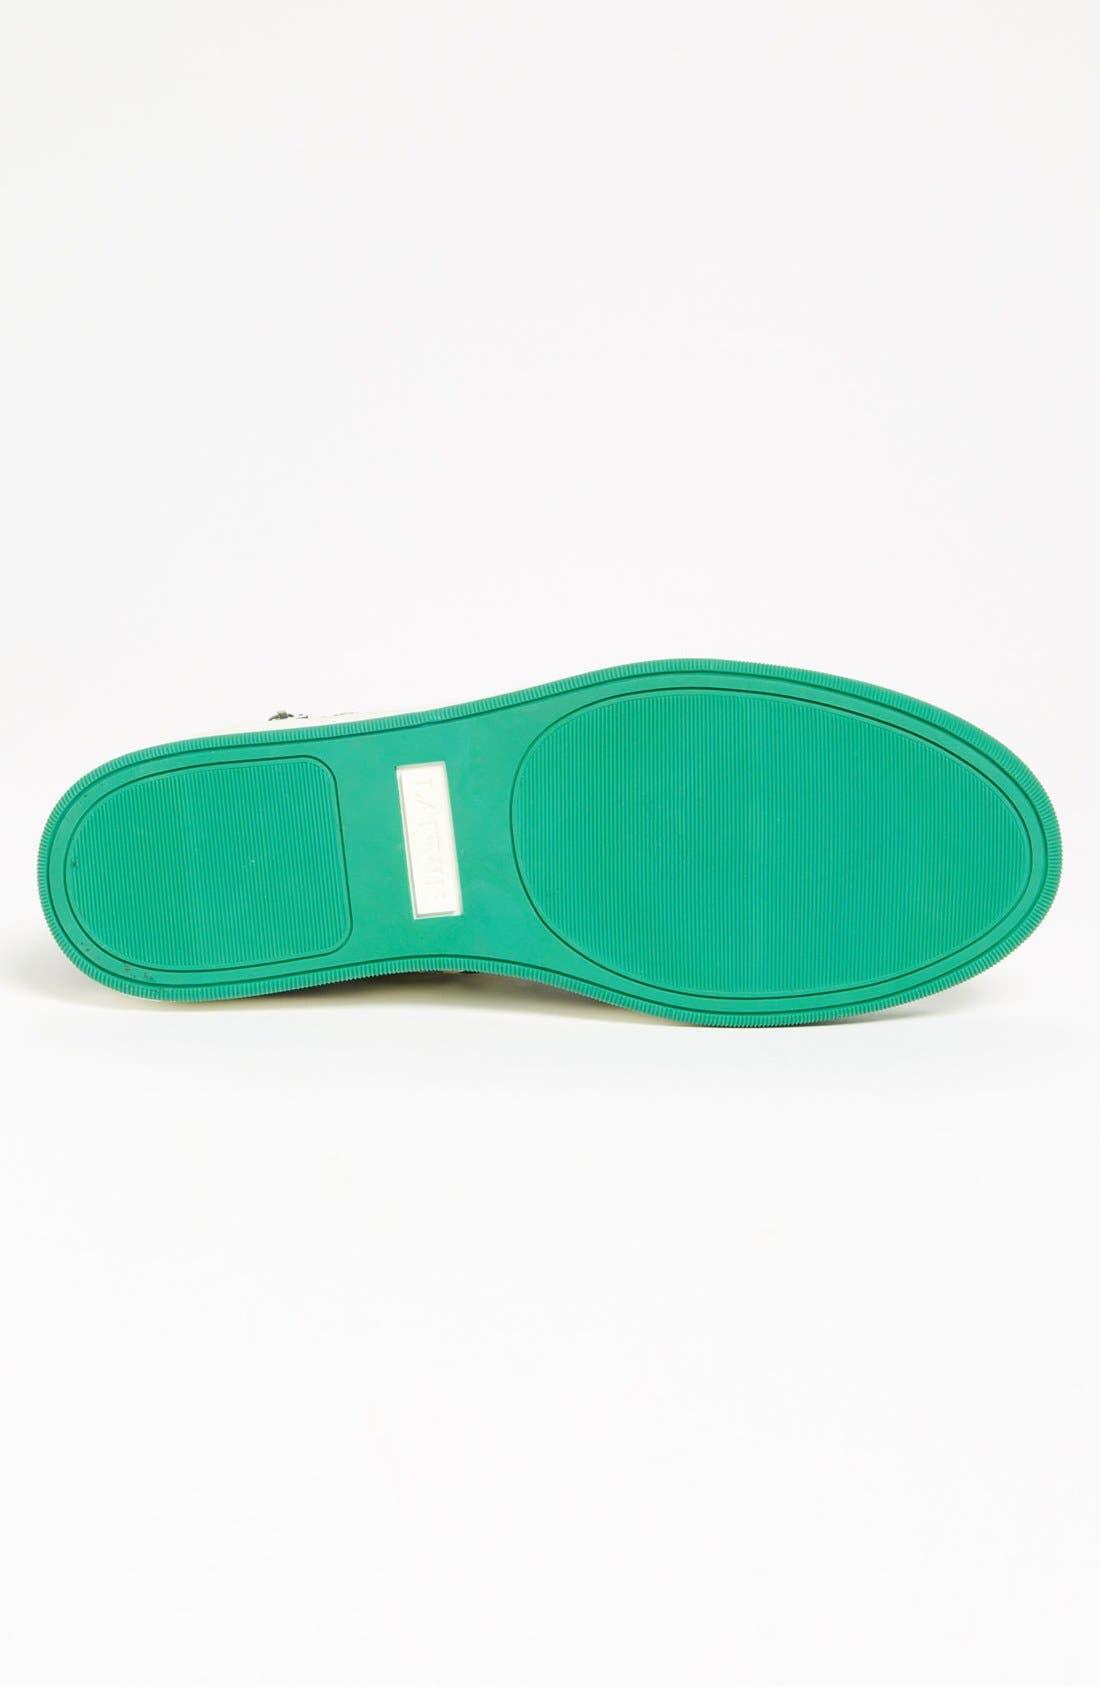 LANVIN, High Top Sneaker, Alternate thumbnail 4, color, 300